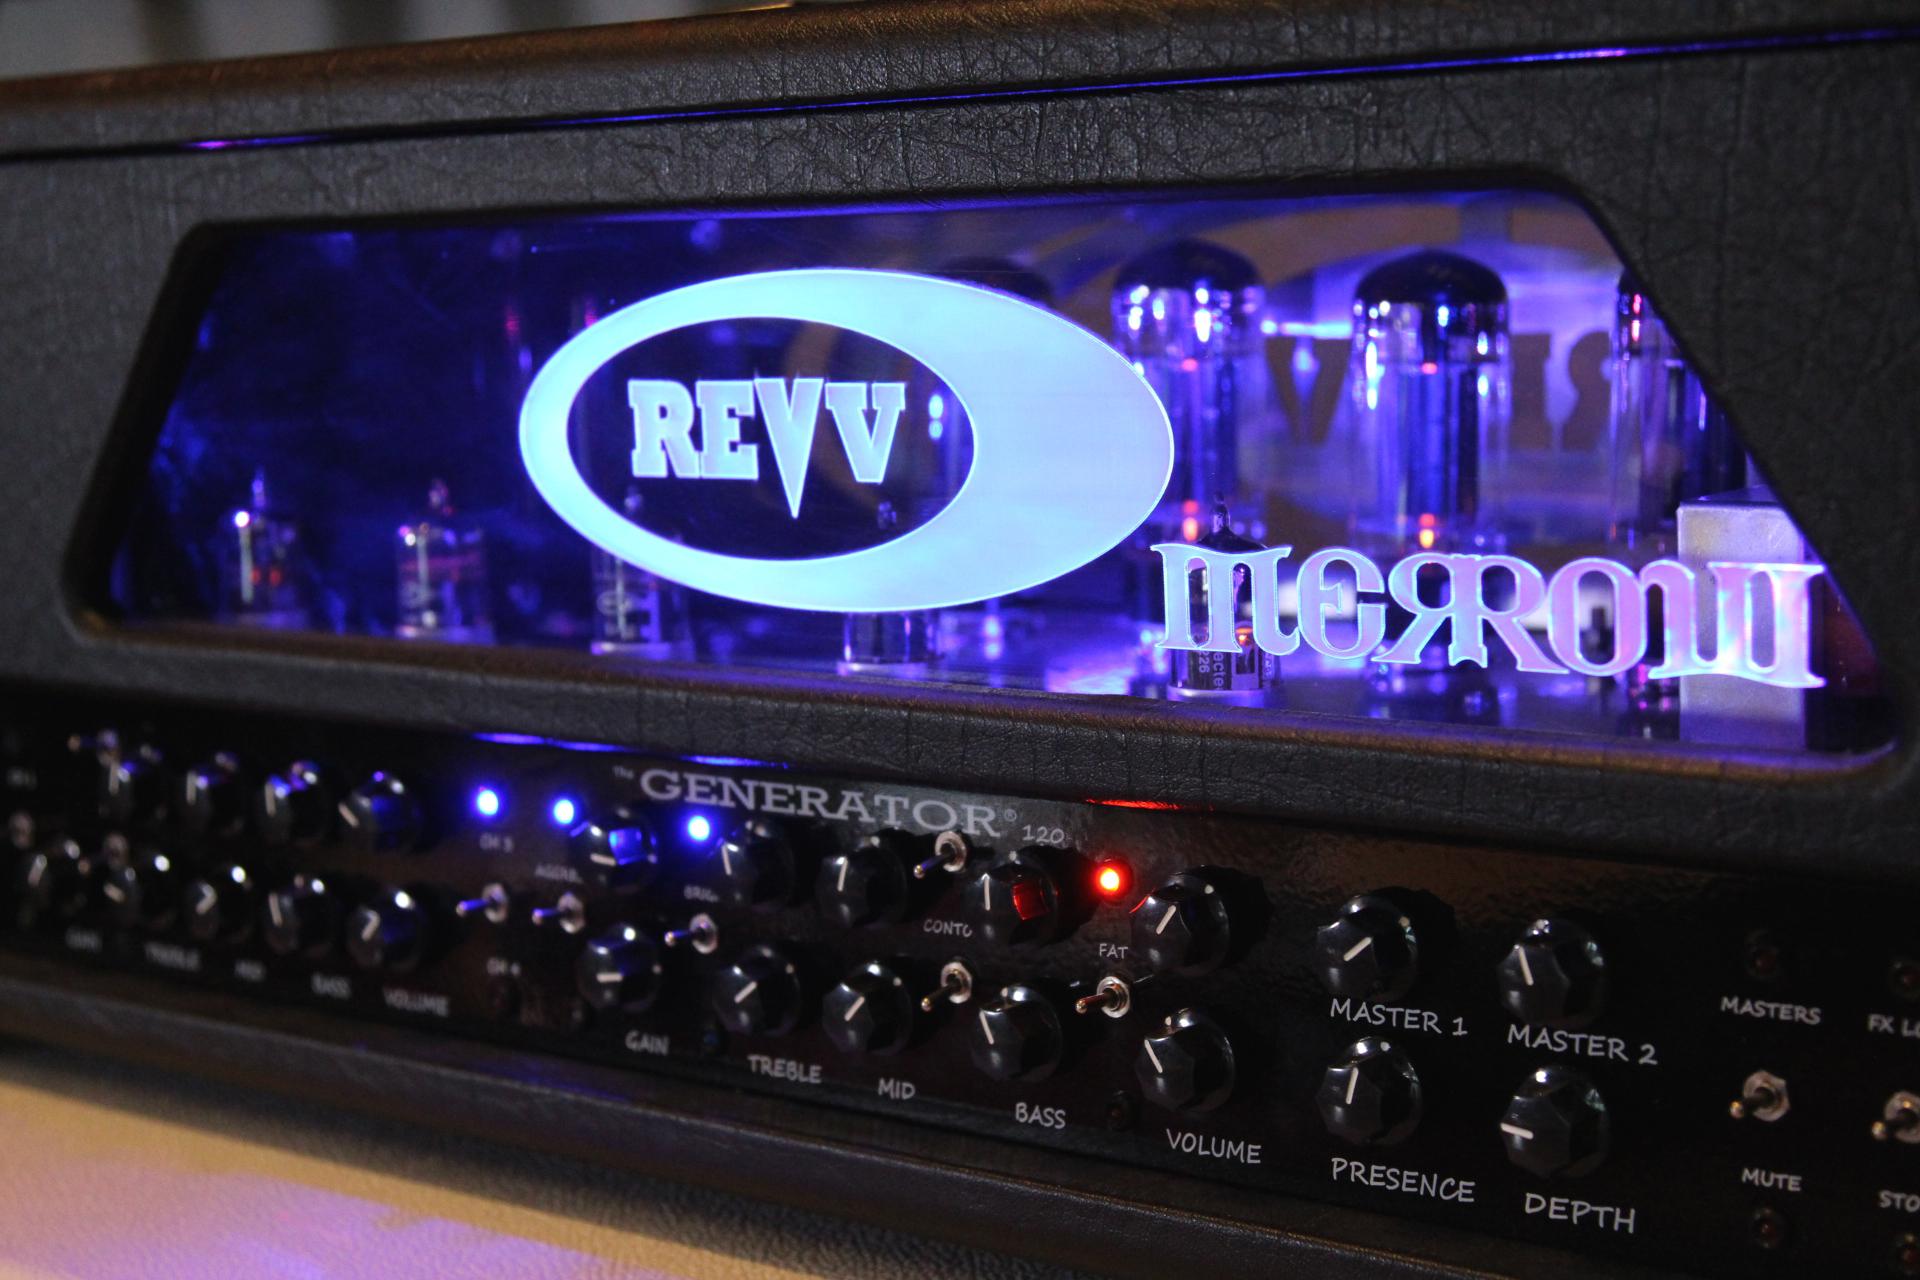 Keith Merrow Revv